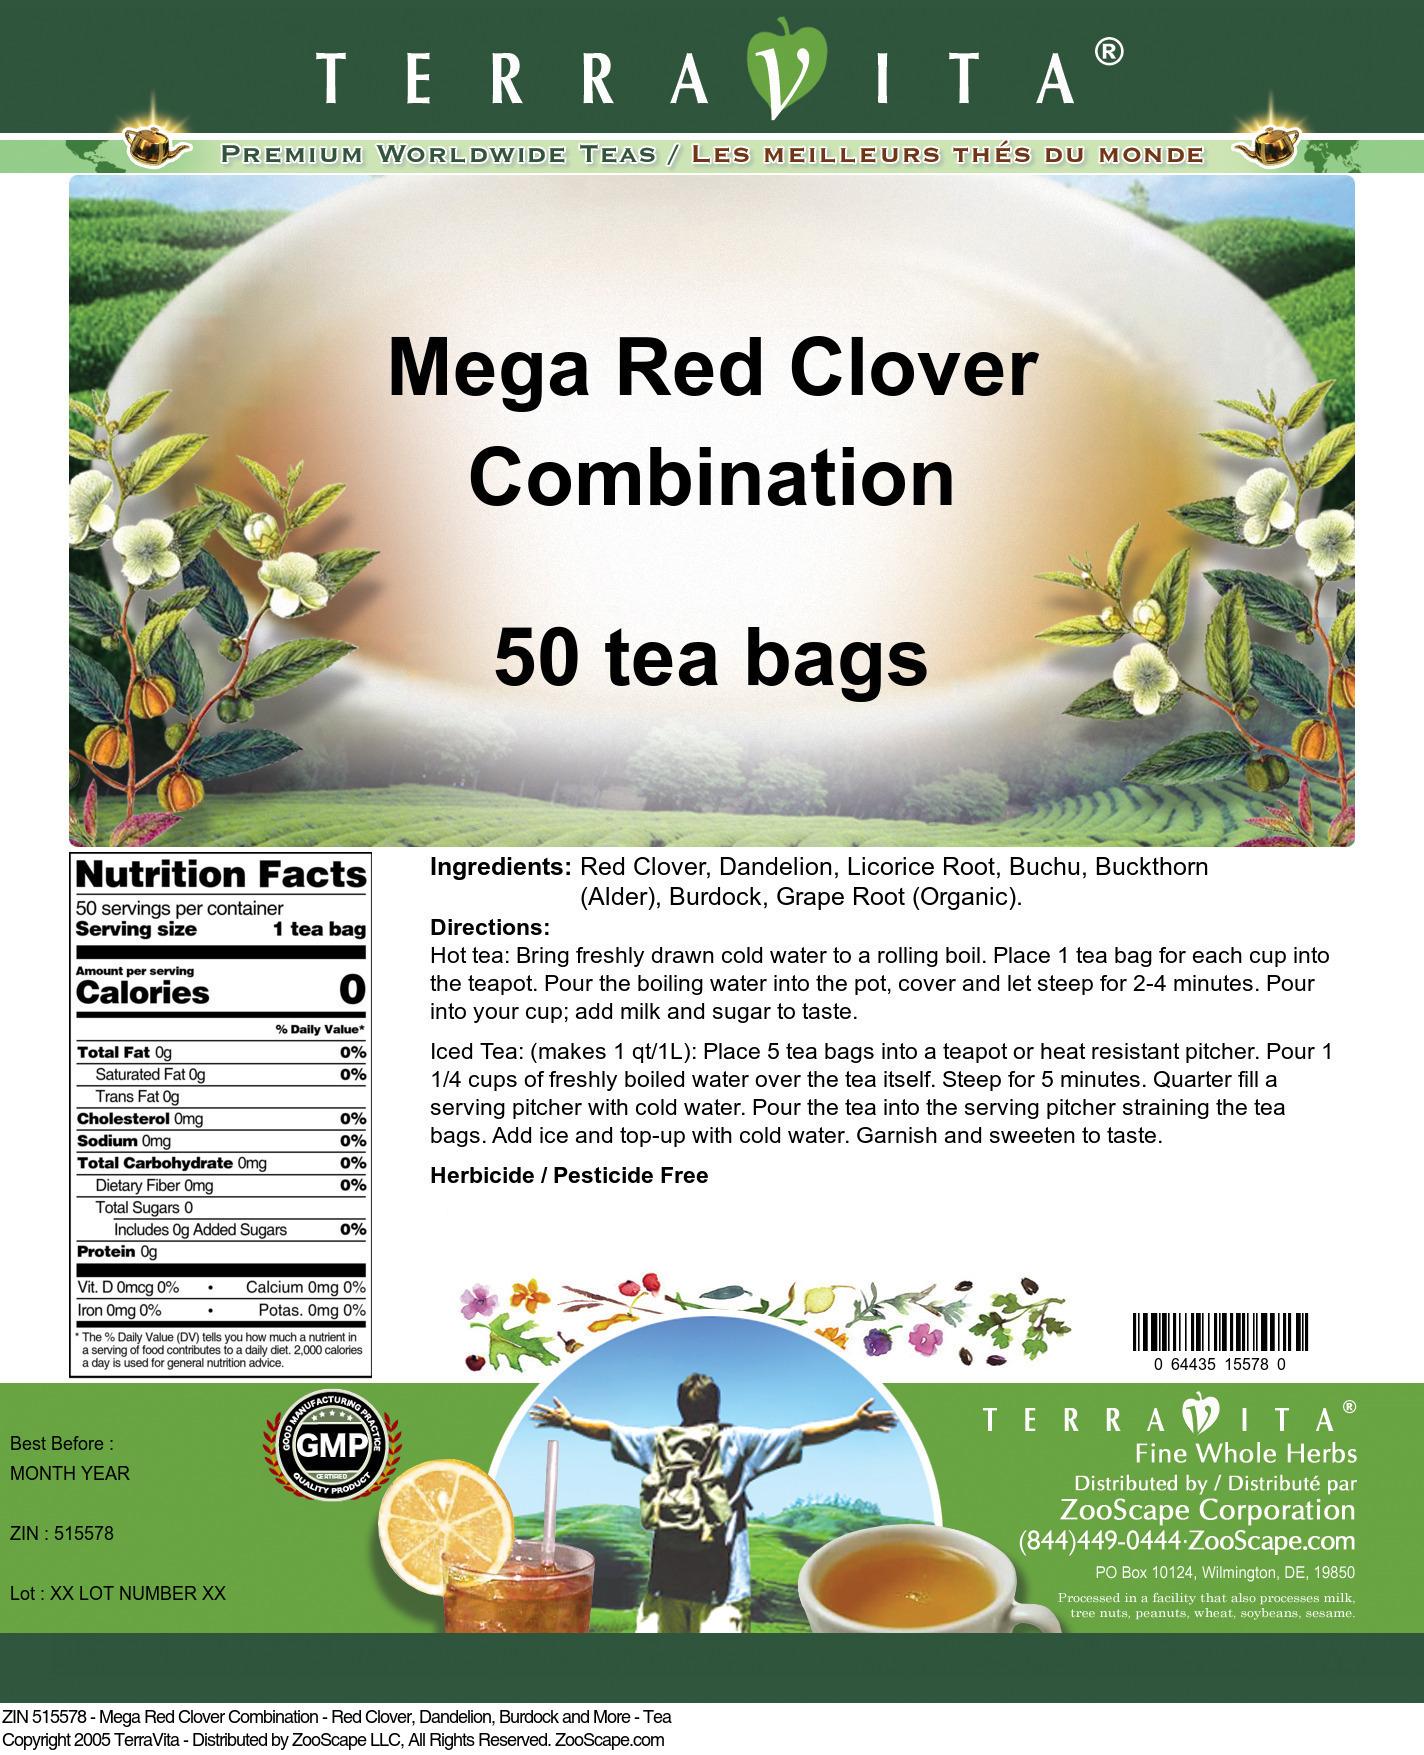 Mega Red Clover Combination - Red Clover, Dandelion, Burdock and More - Tea